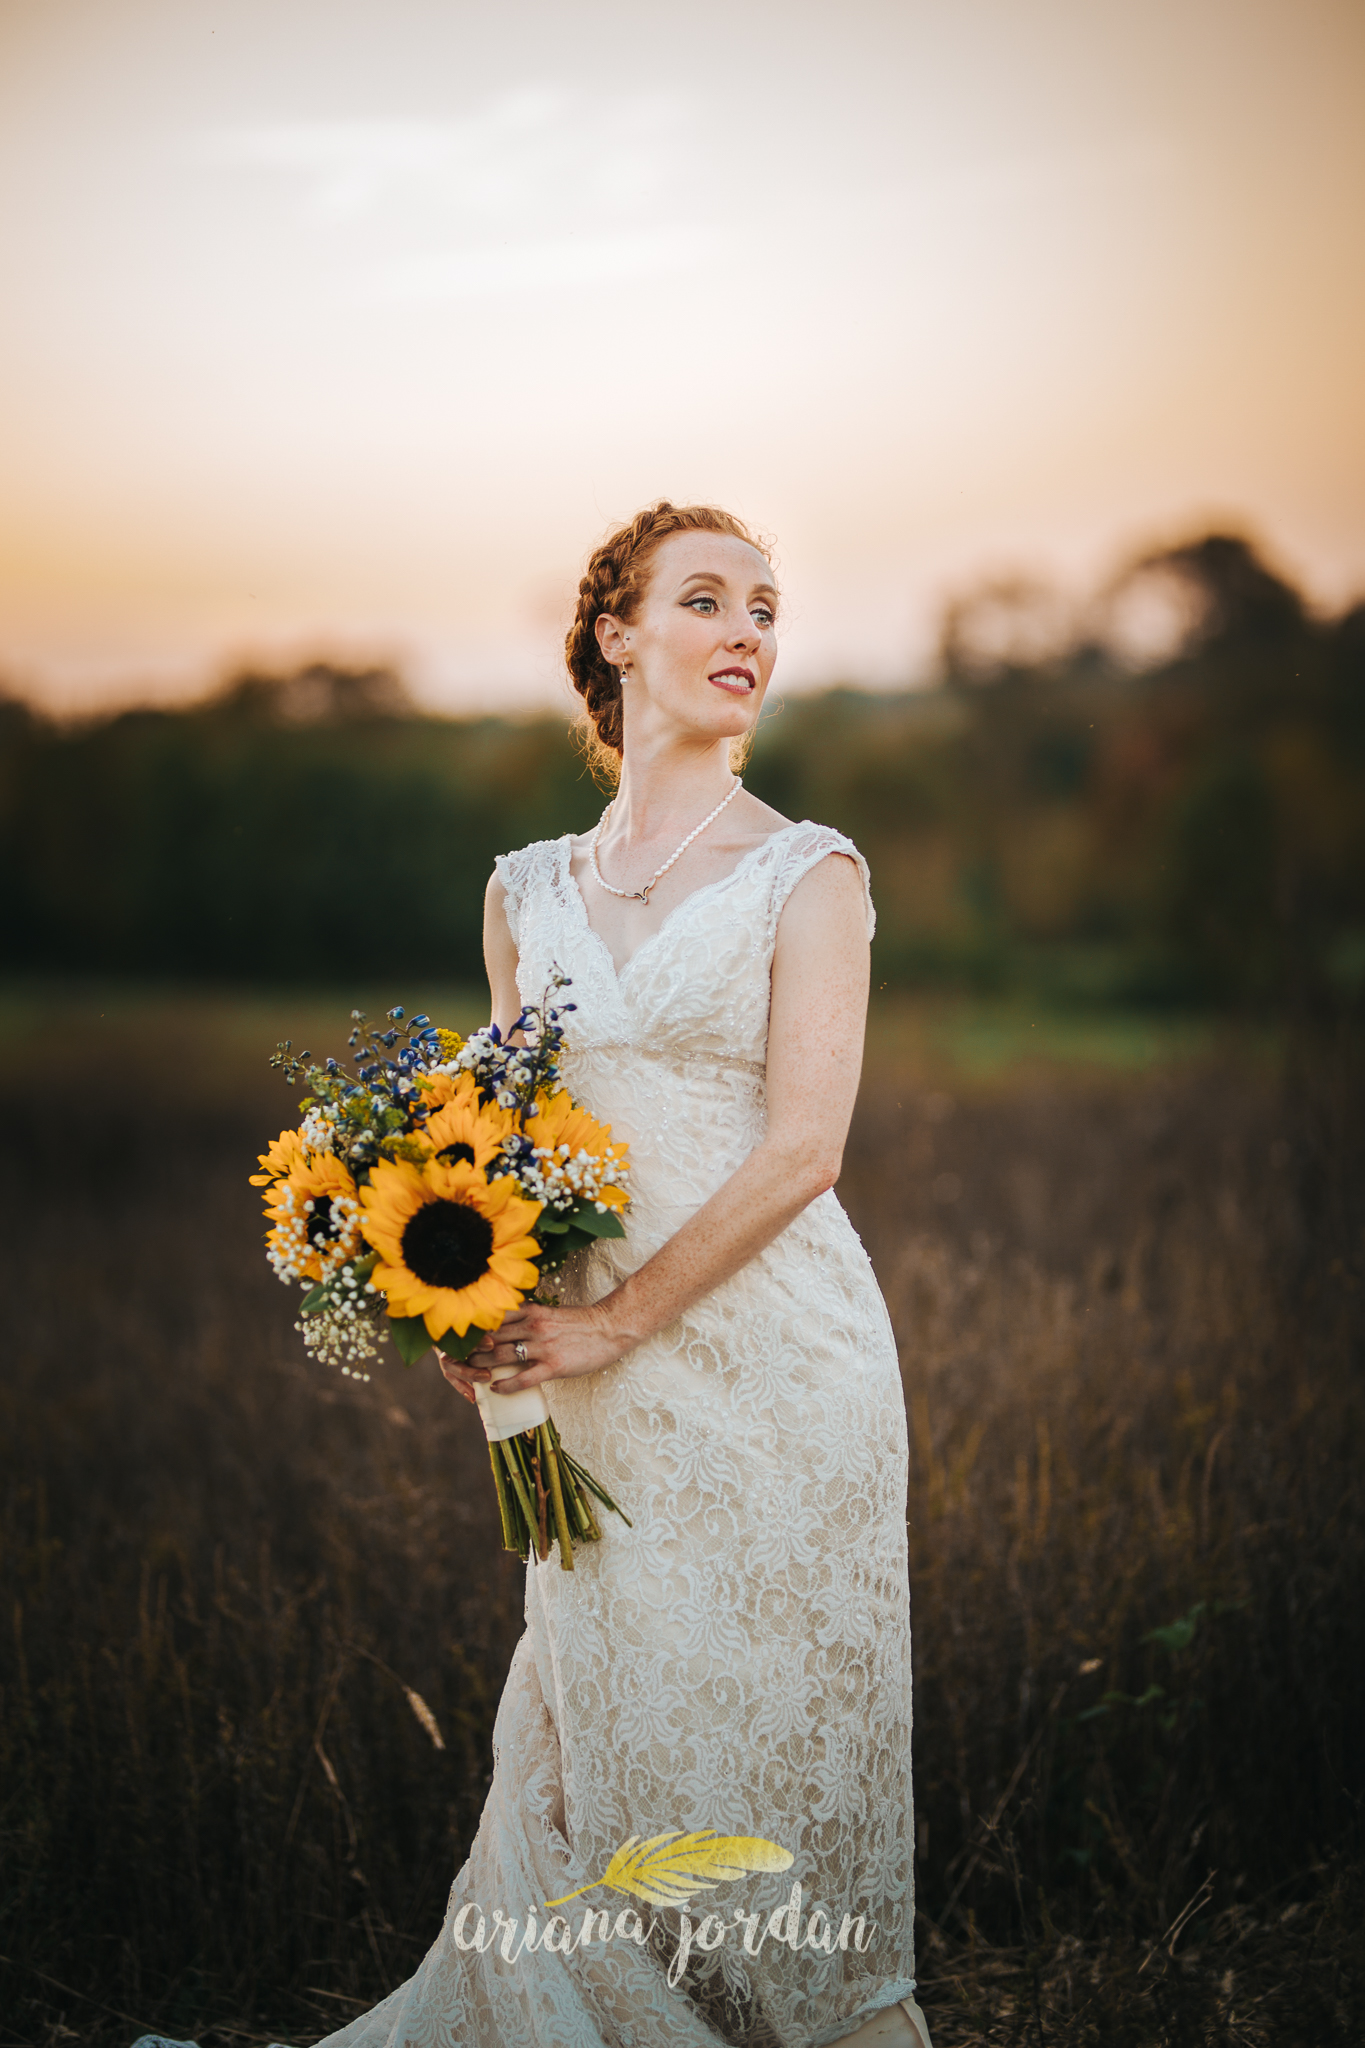 137 Ariana Jordan Photography -Moonlight Fields Lexington Ky Wedding Photographer 5166.jpg